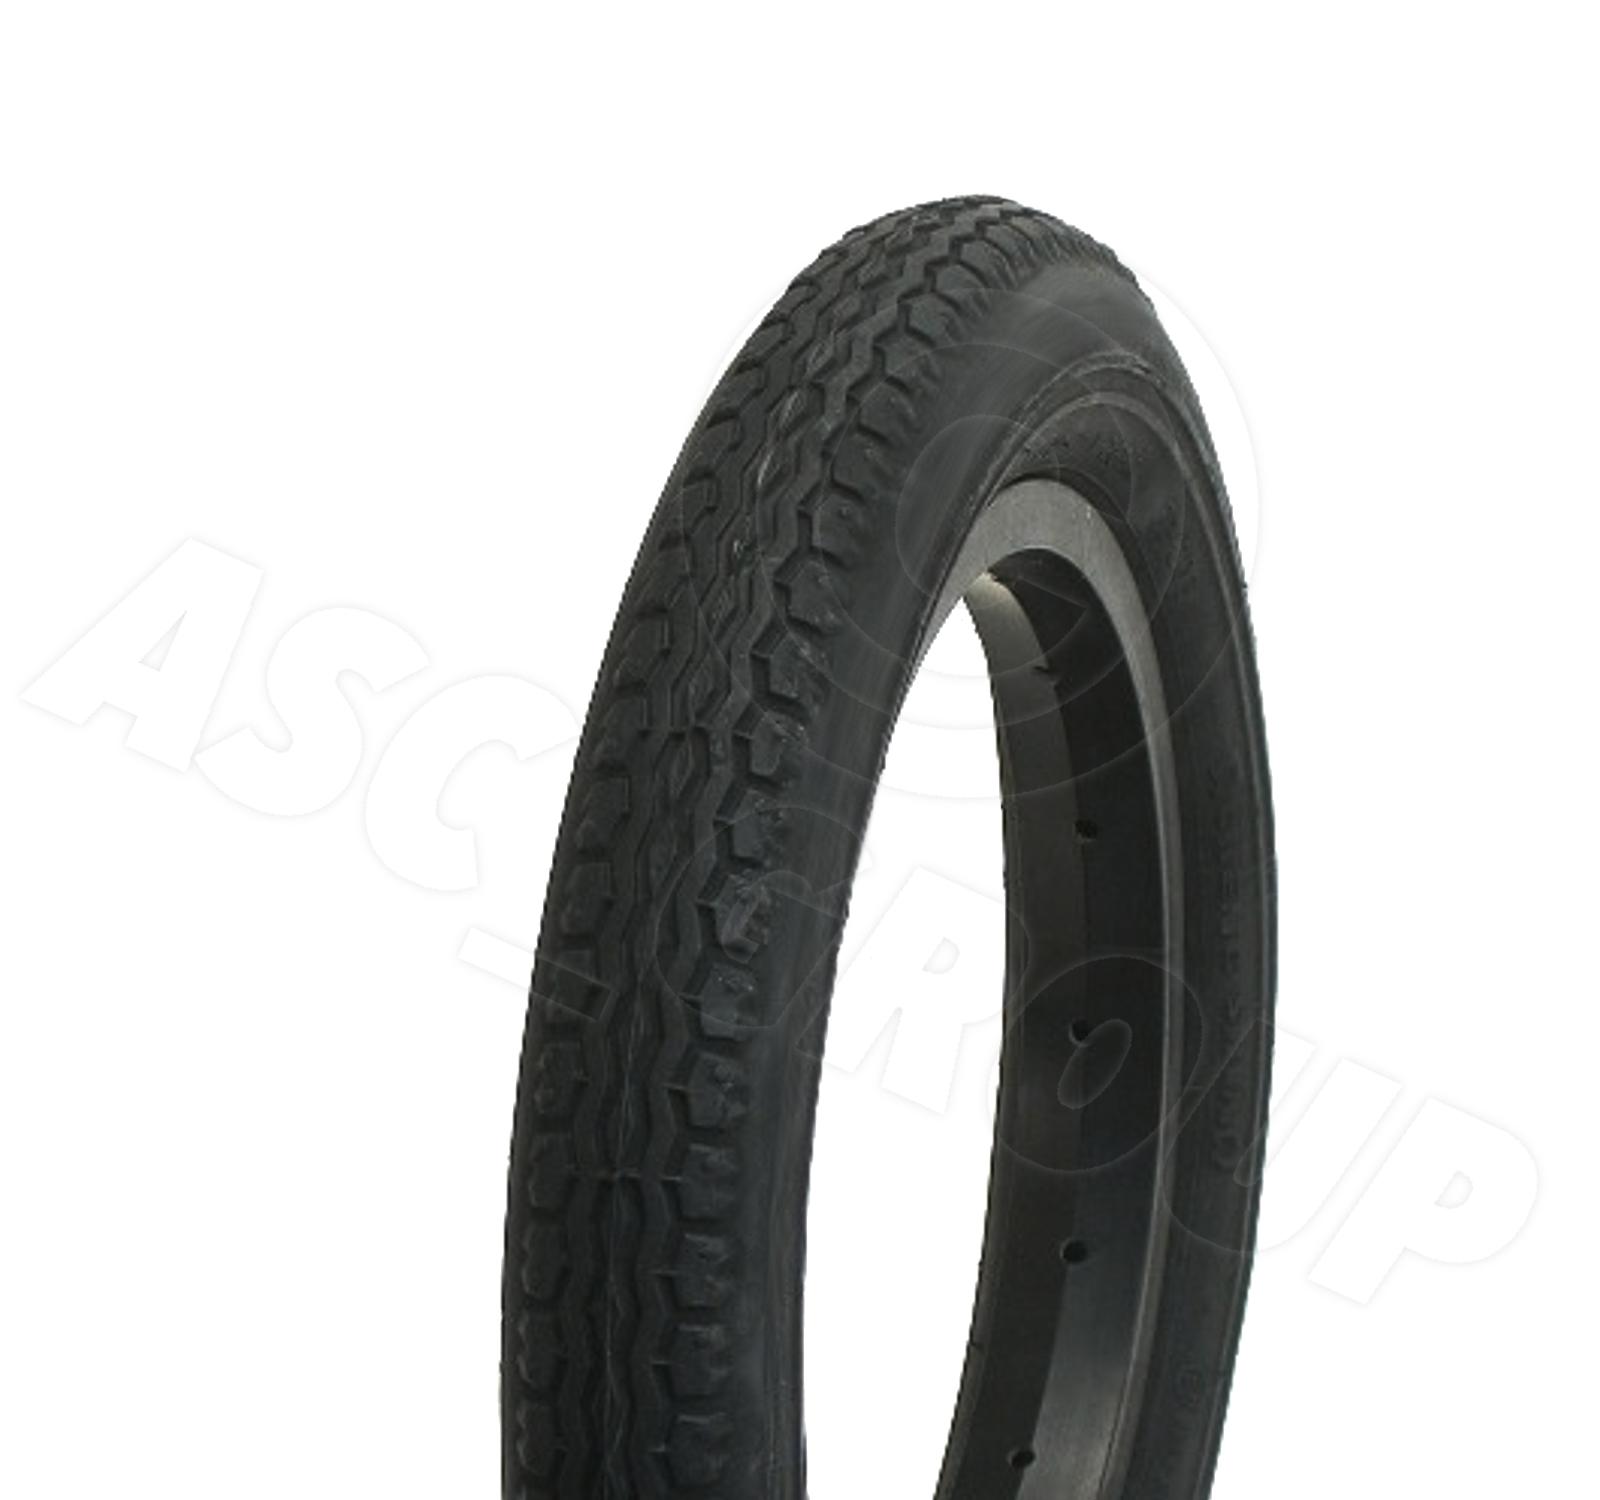 2x Schwalbe HS140 47-203 12 1//2x1.75 Pram Tyres to fit Phil /& Teds Dash